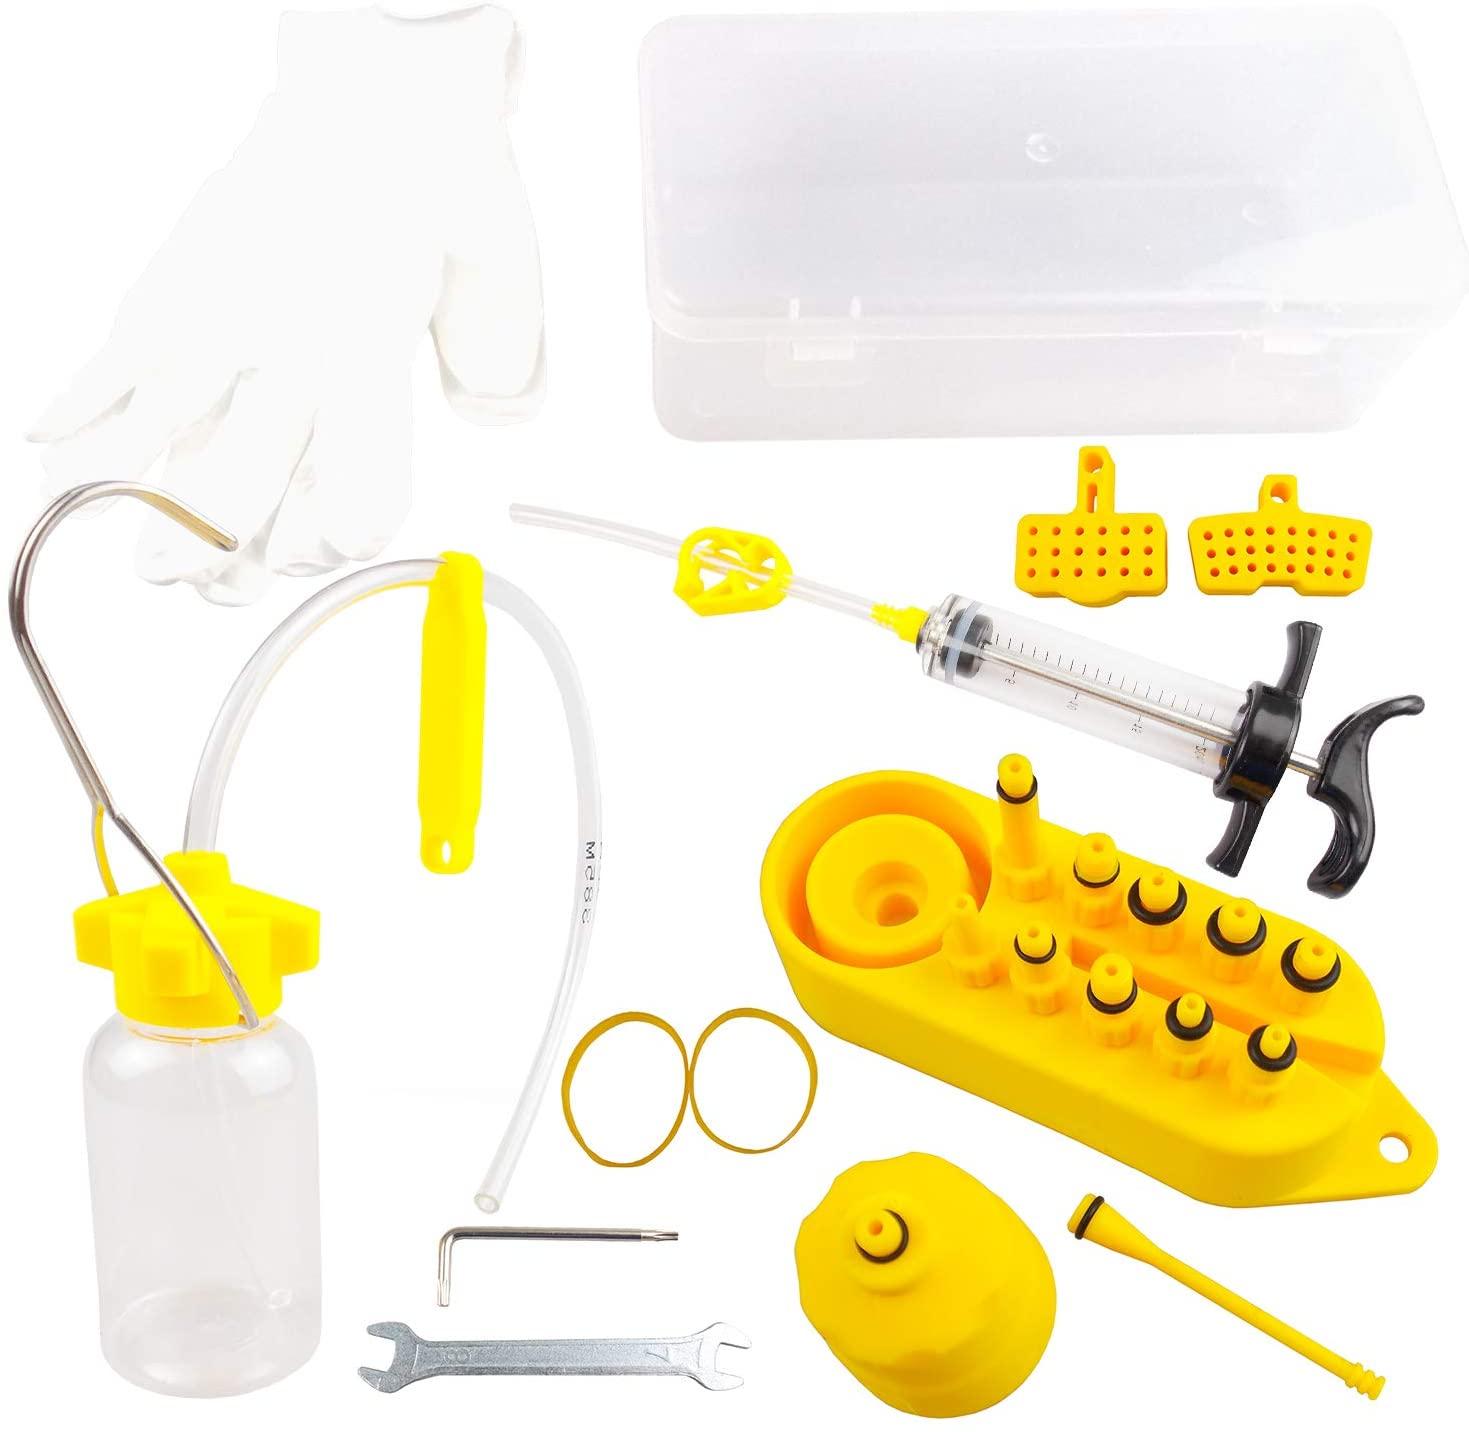 Lixada Bike Repair Tool Kits Professional Hydraulic Disc Brake Bleed Kit Hydraulic Mineral Disc Brake Bleed Kit Tool for All Dot Brakes